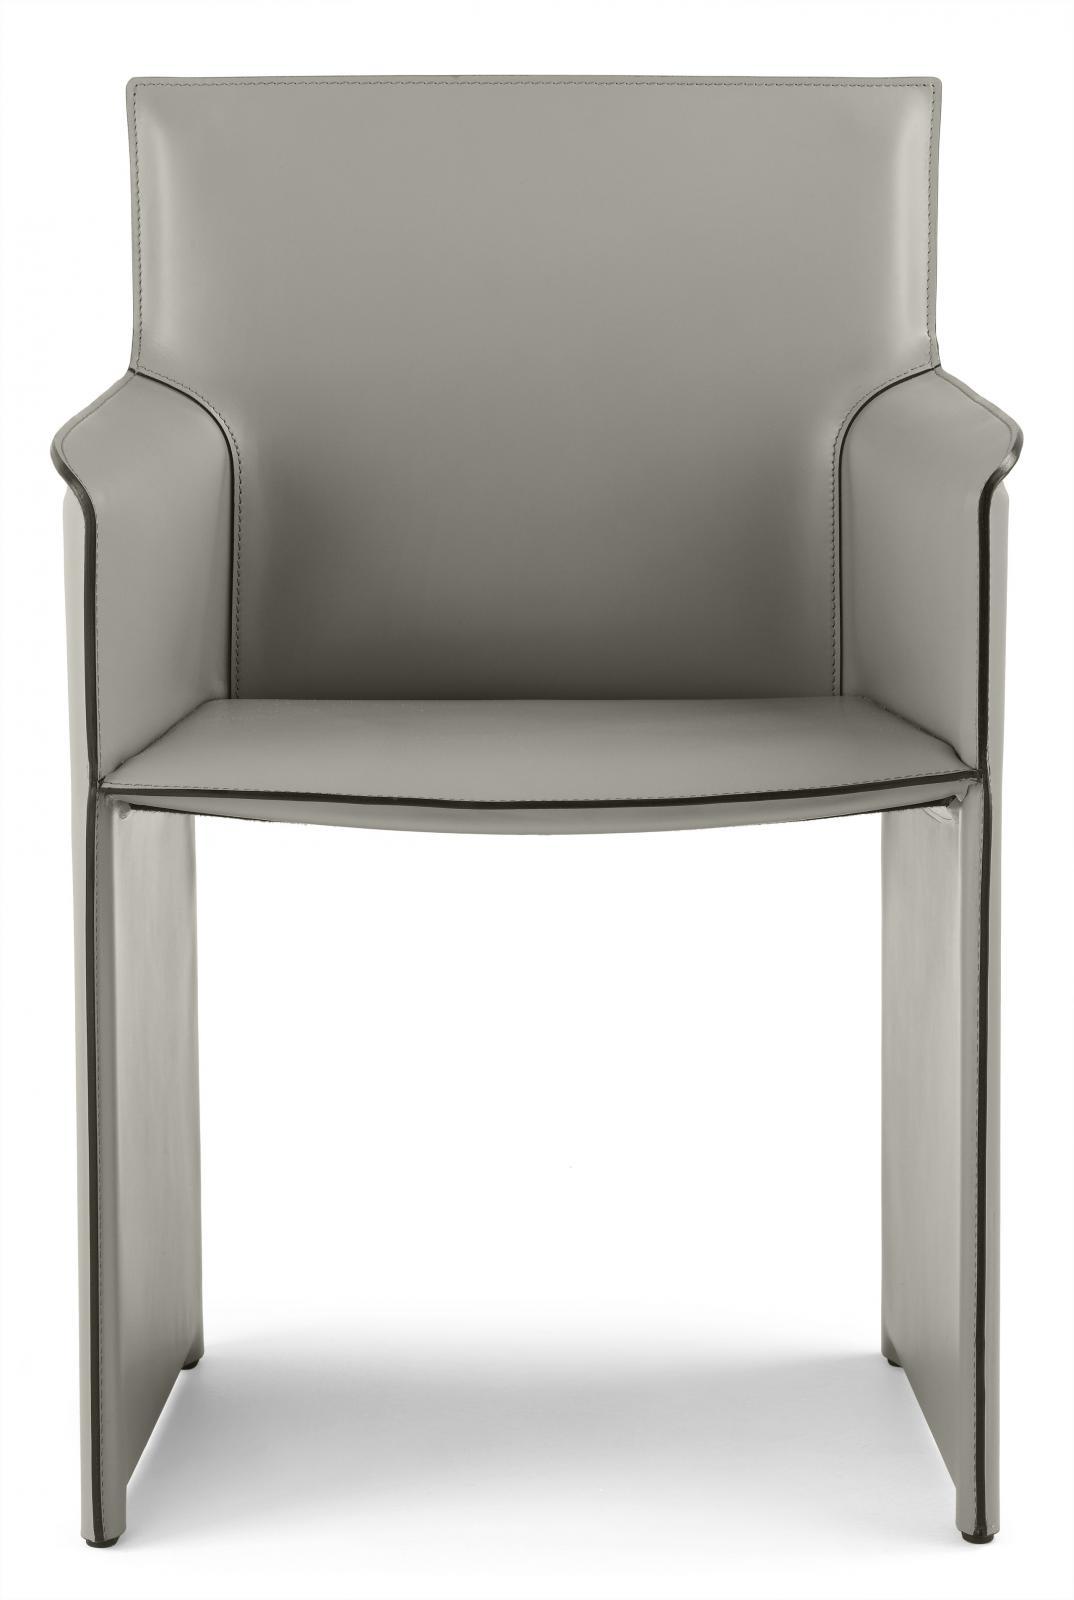 MDC 115 Modern Dining Chairs